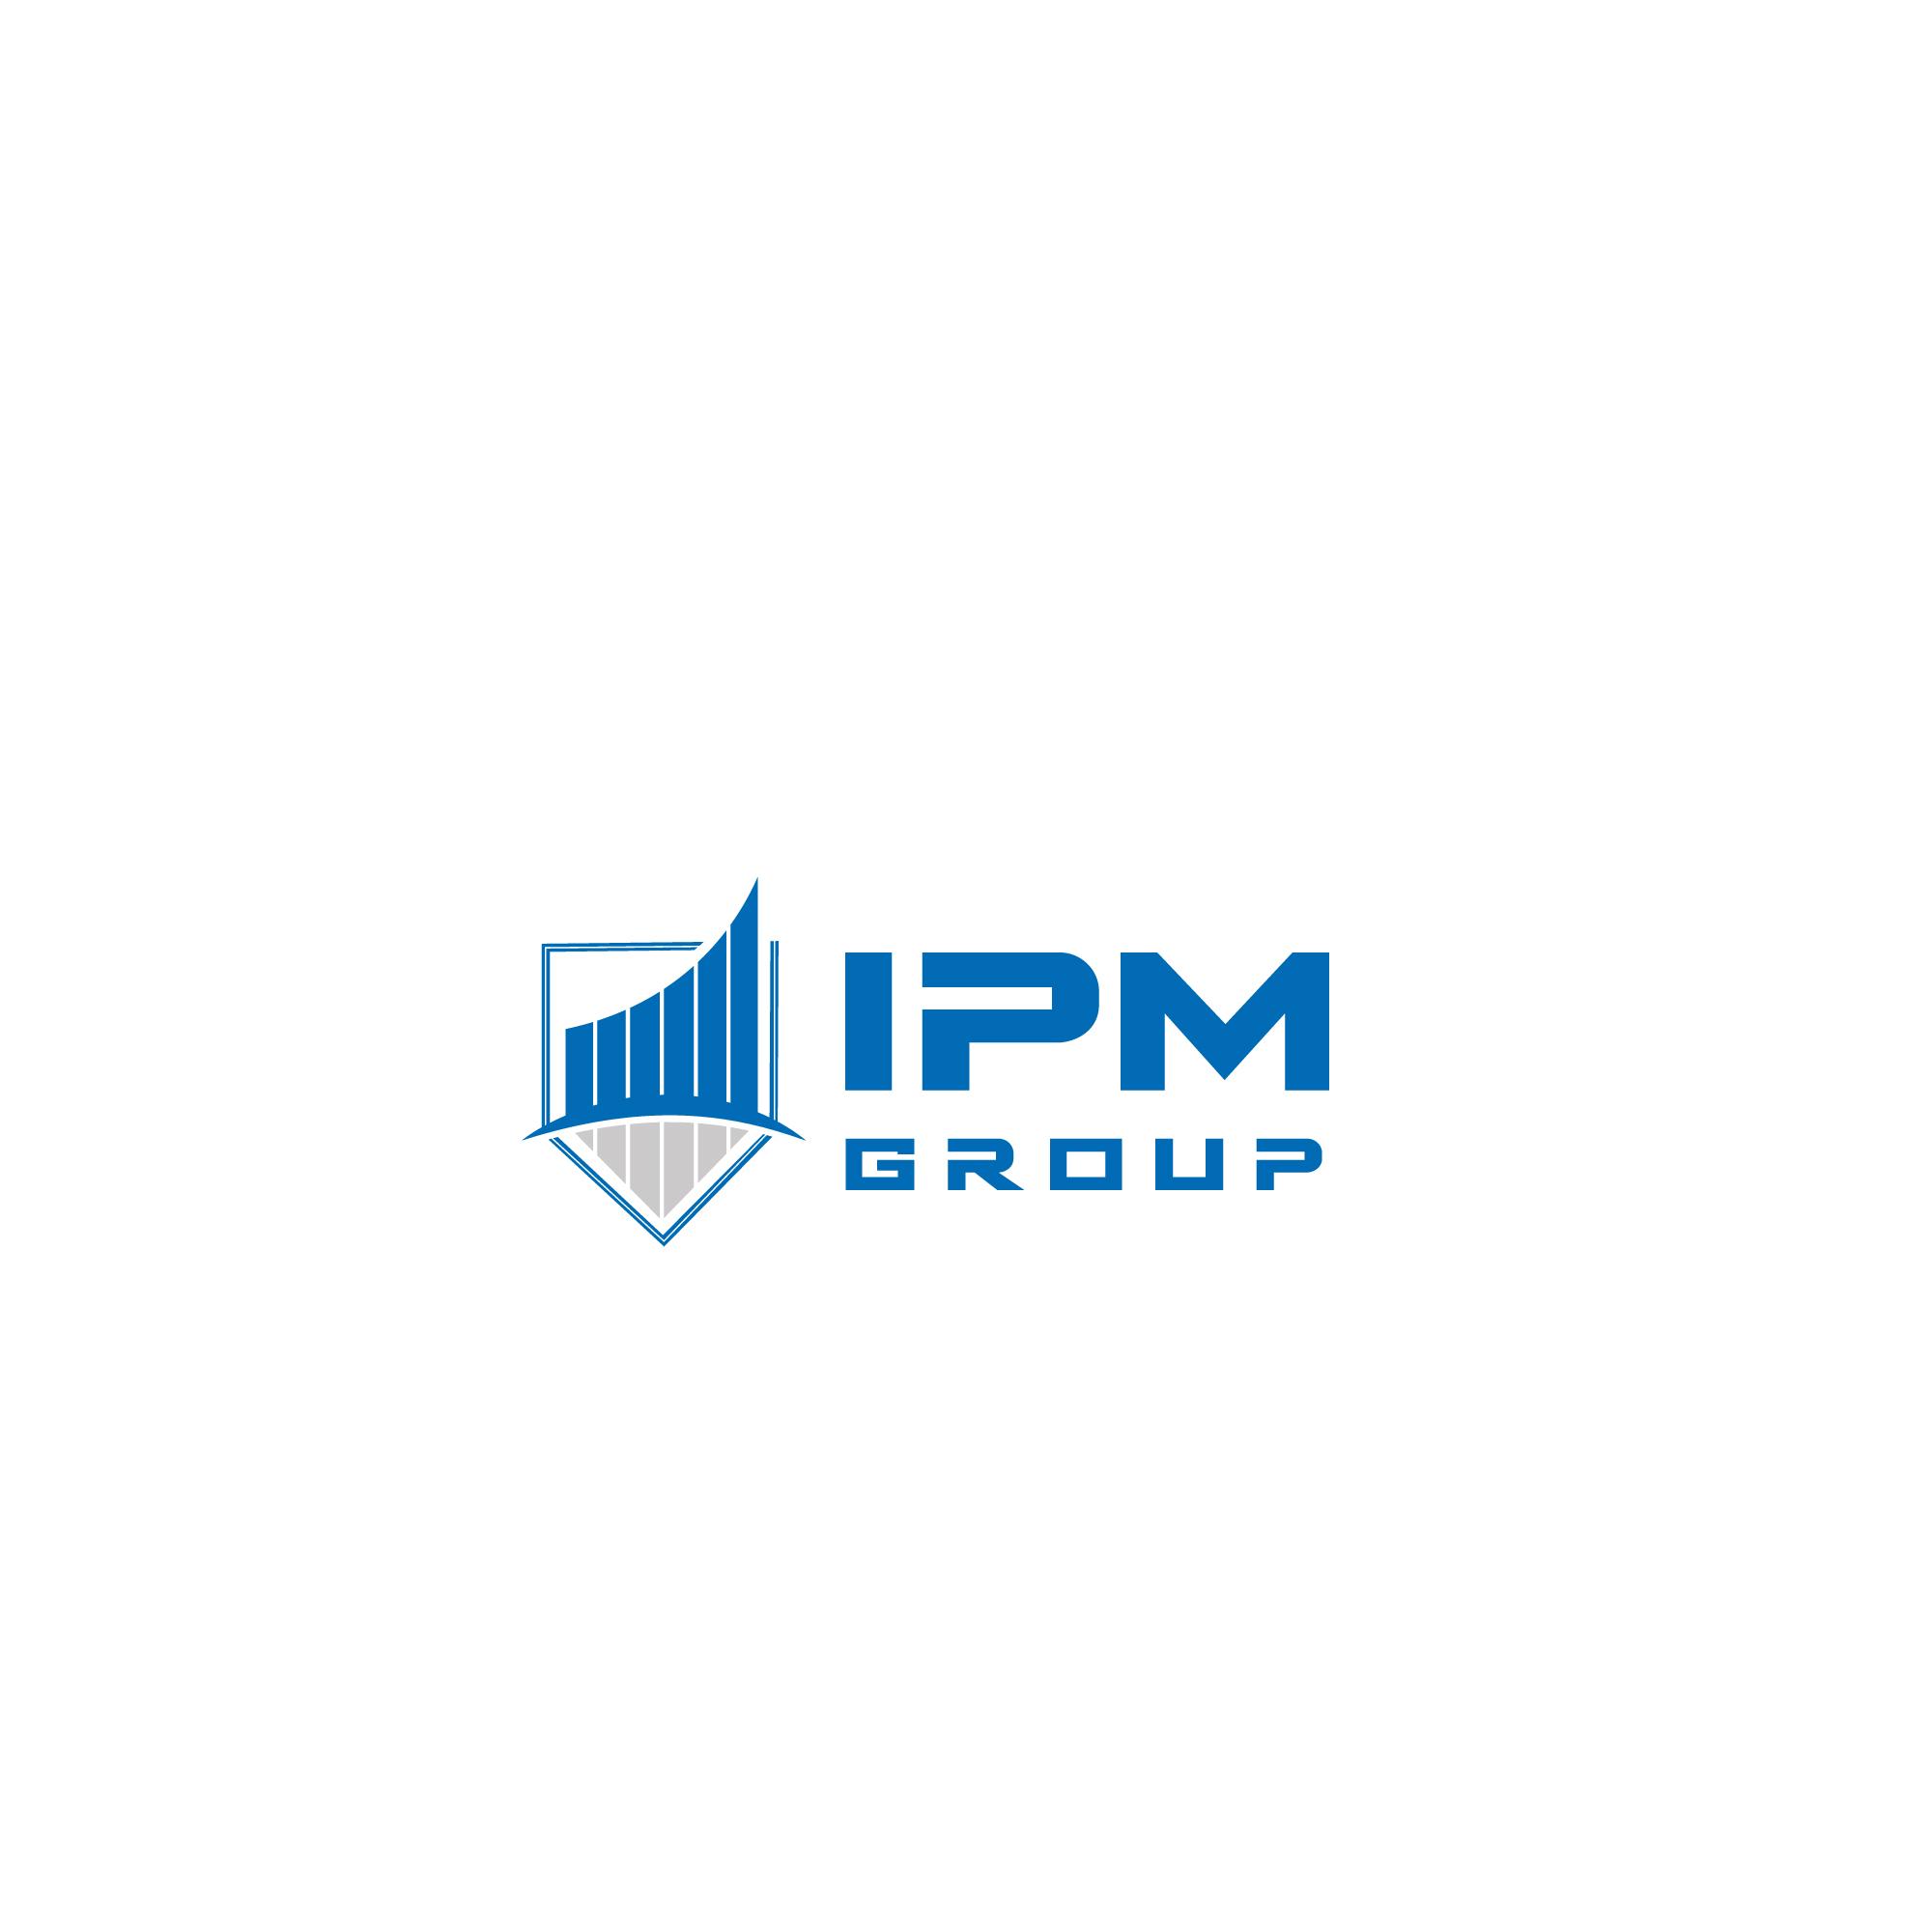 Разработка логотипа для управляющей компании фото f_0575f849465ab90b.jpg